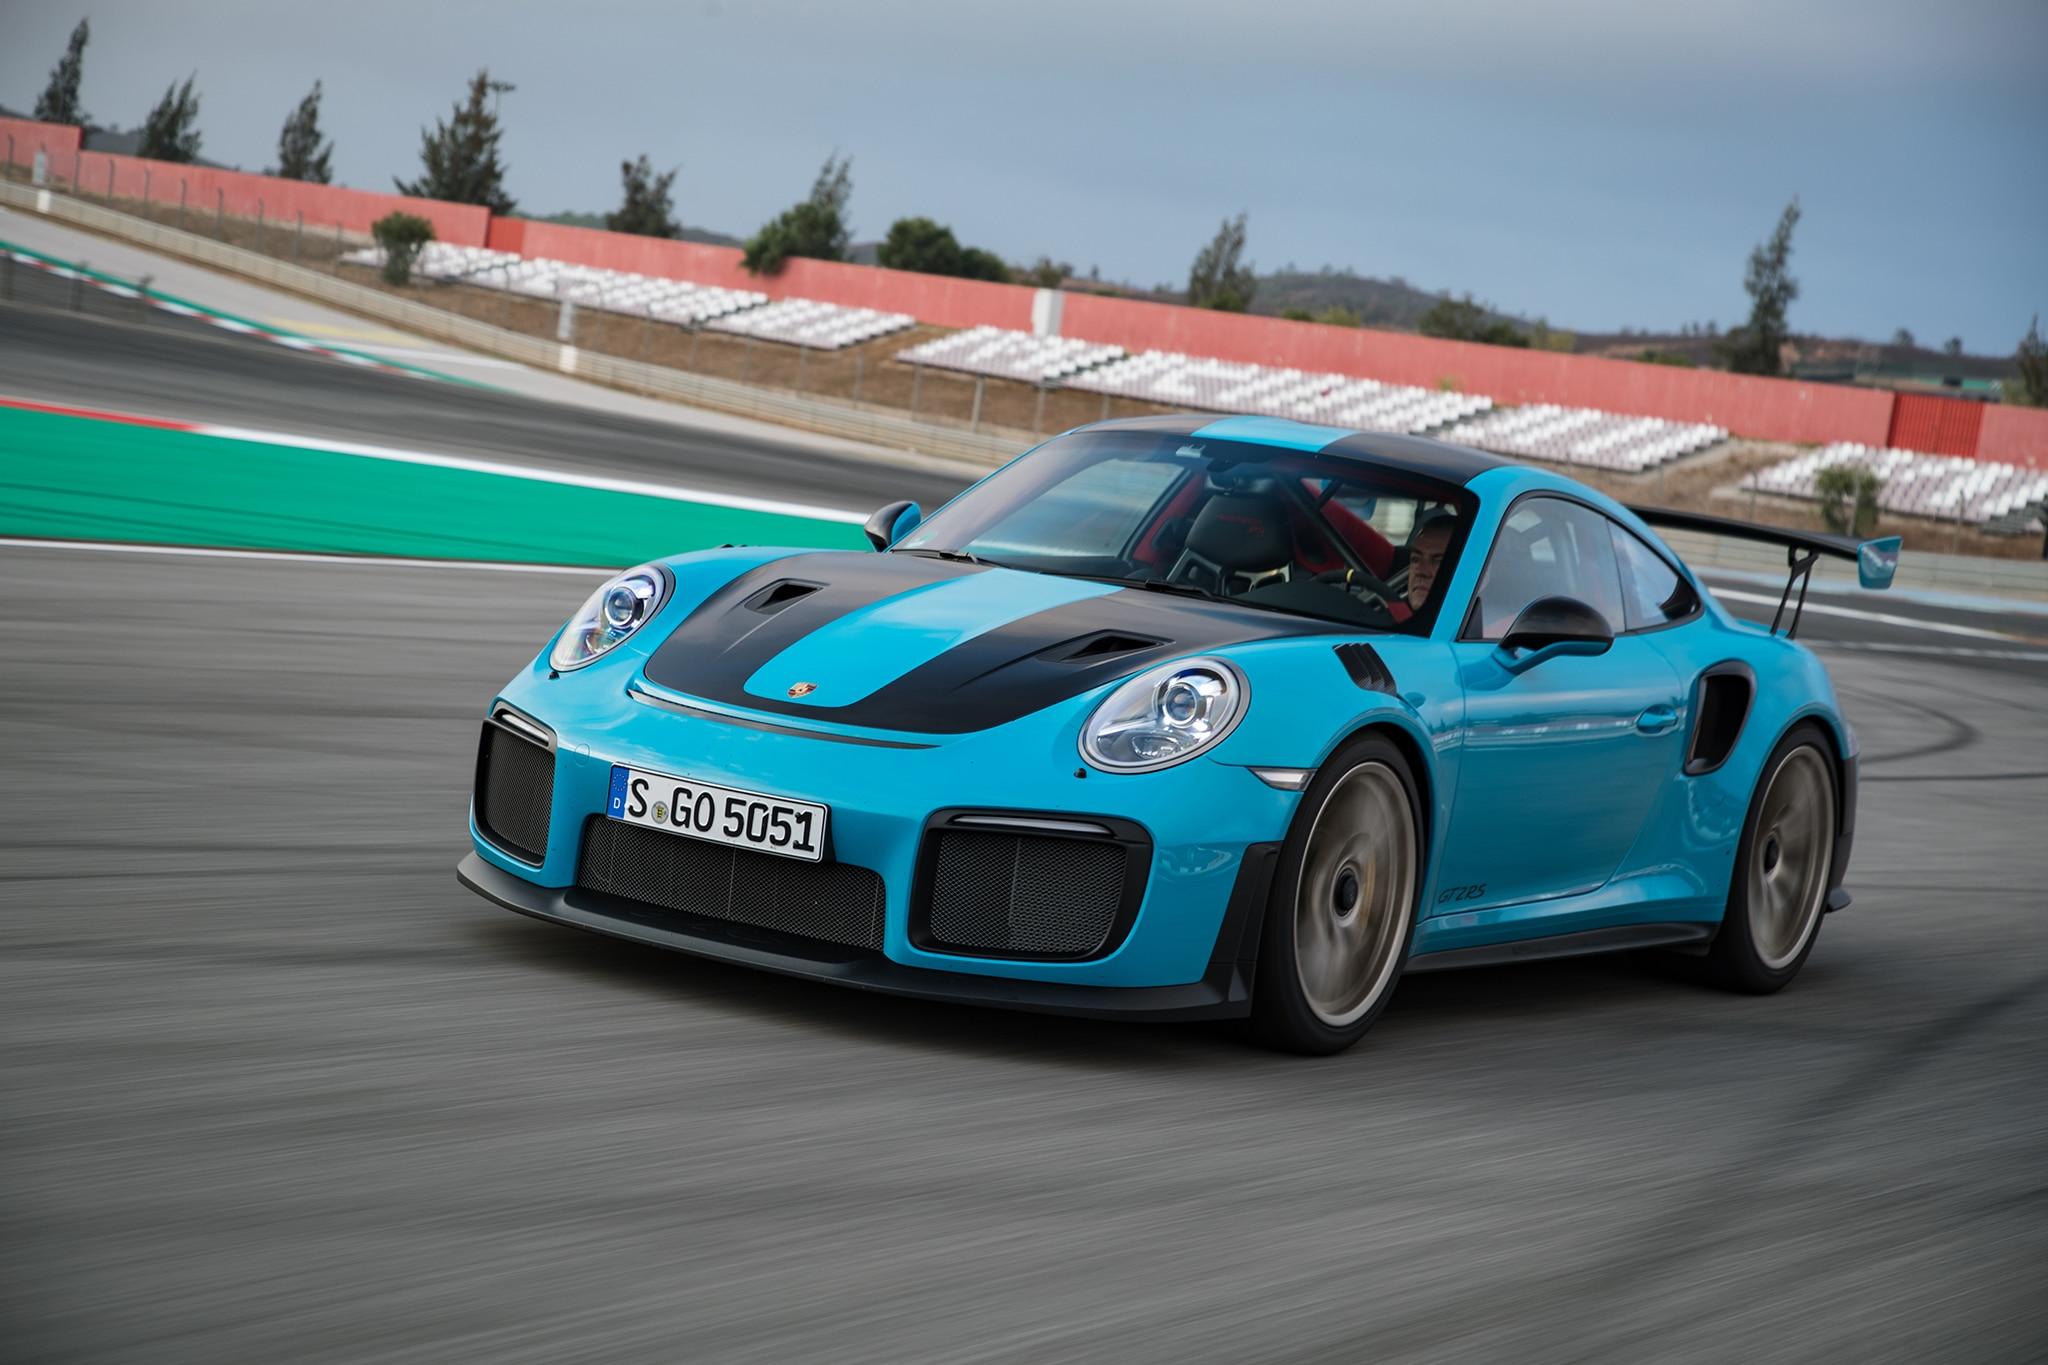 2018 Porsche 911 GT2 RS Front Three Quarter In Motion 34